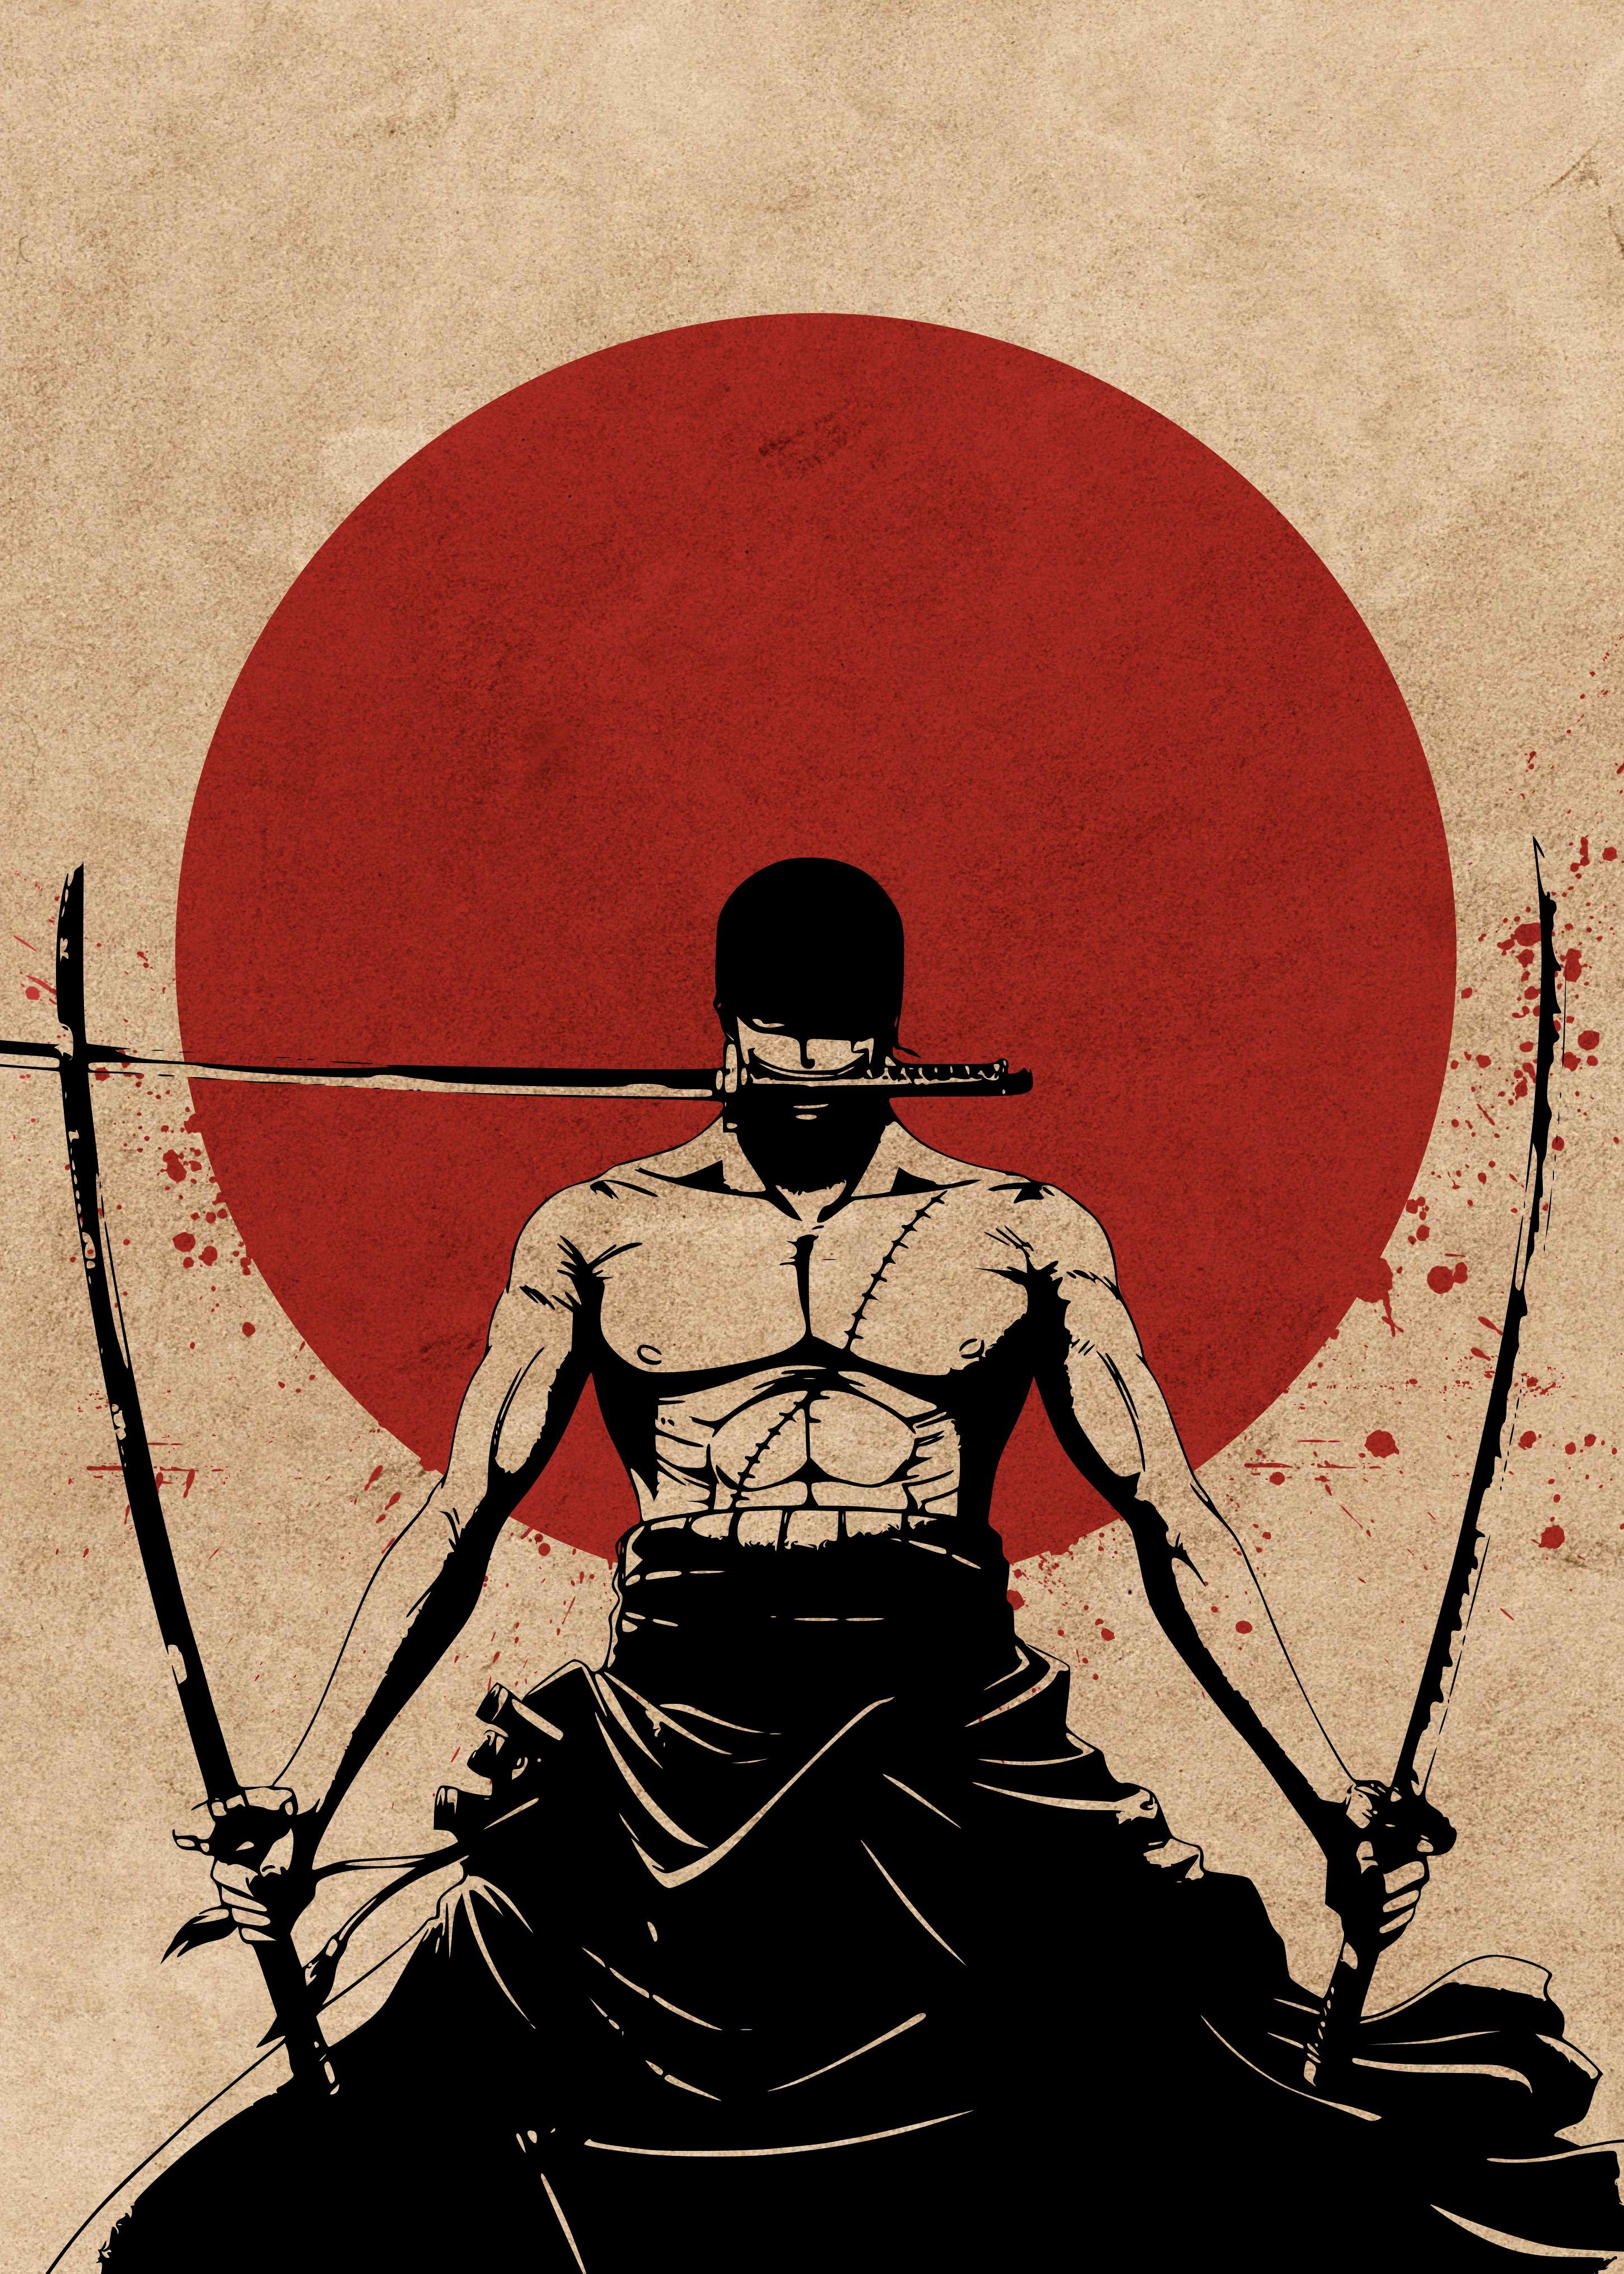 Roronoa Zoro One Piece Samurai Dessin Fond D Ecran Dessin Illustrations Animees